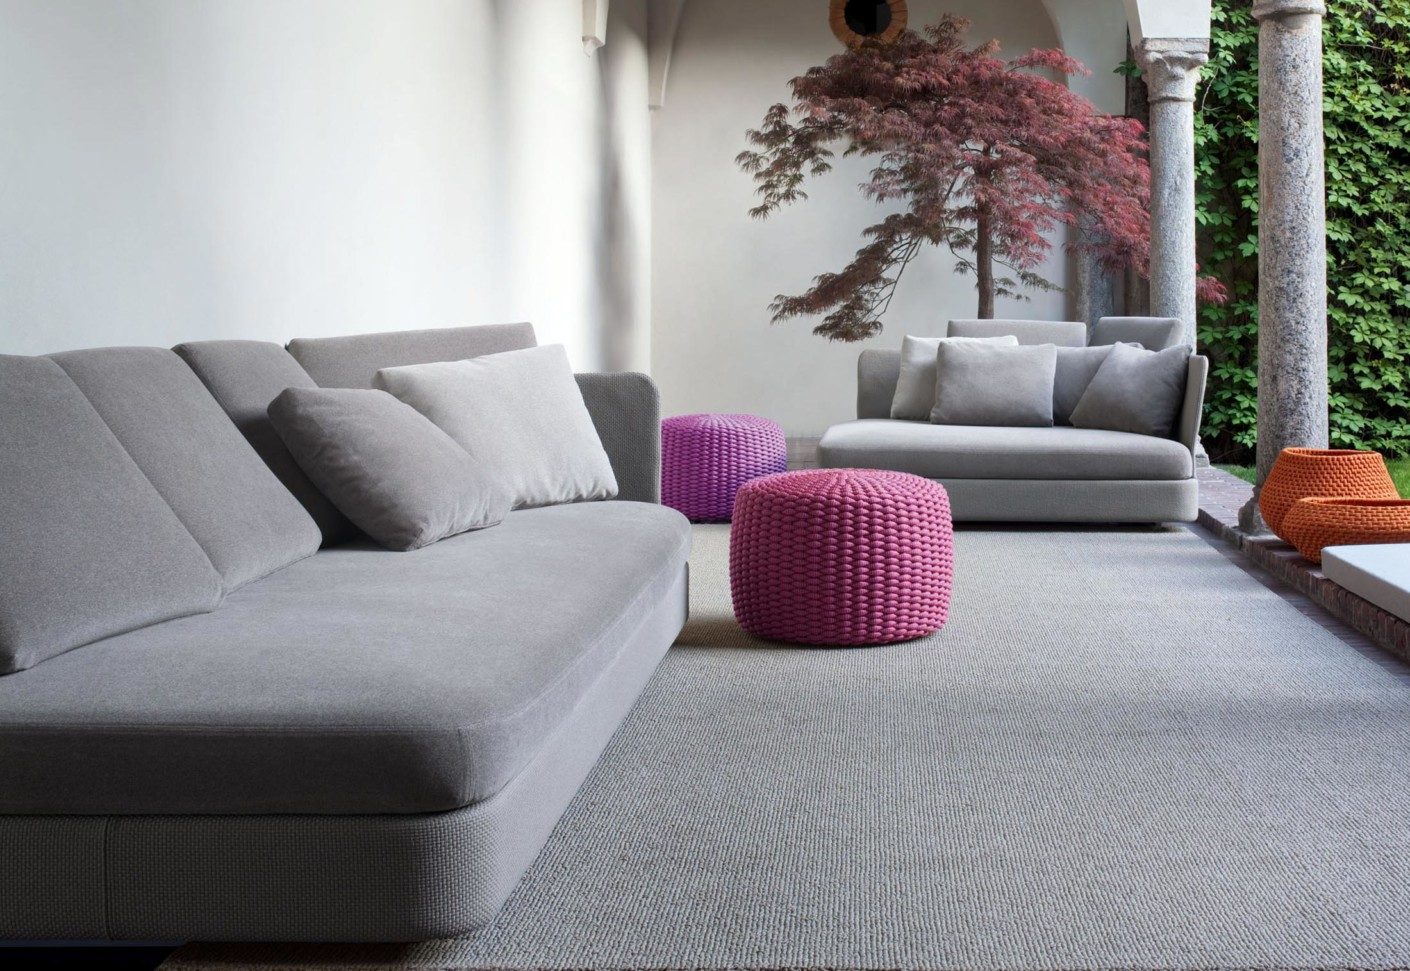 Cove Sofa By Paola Lenti Stylepark